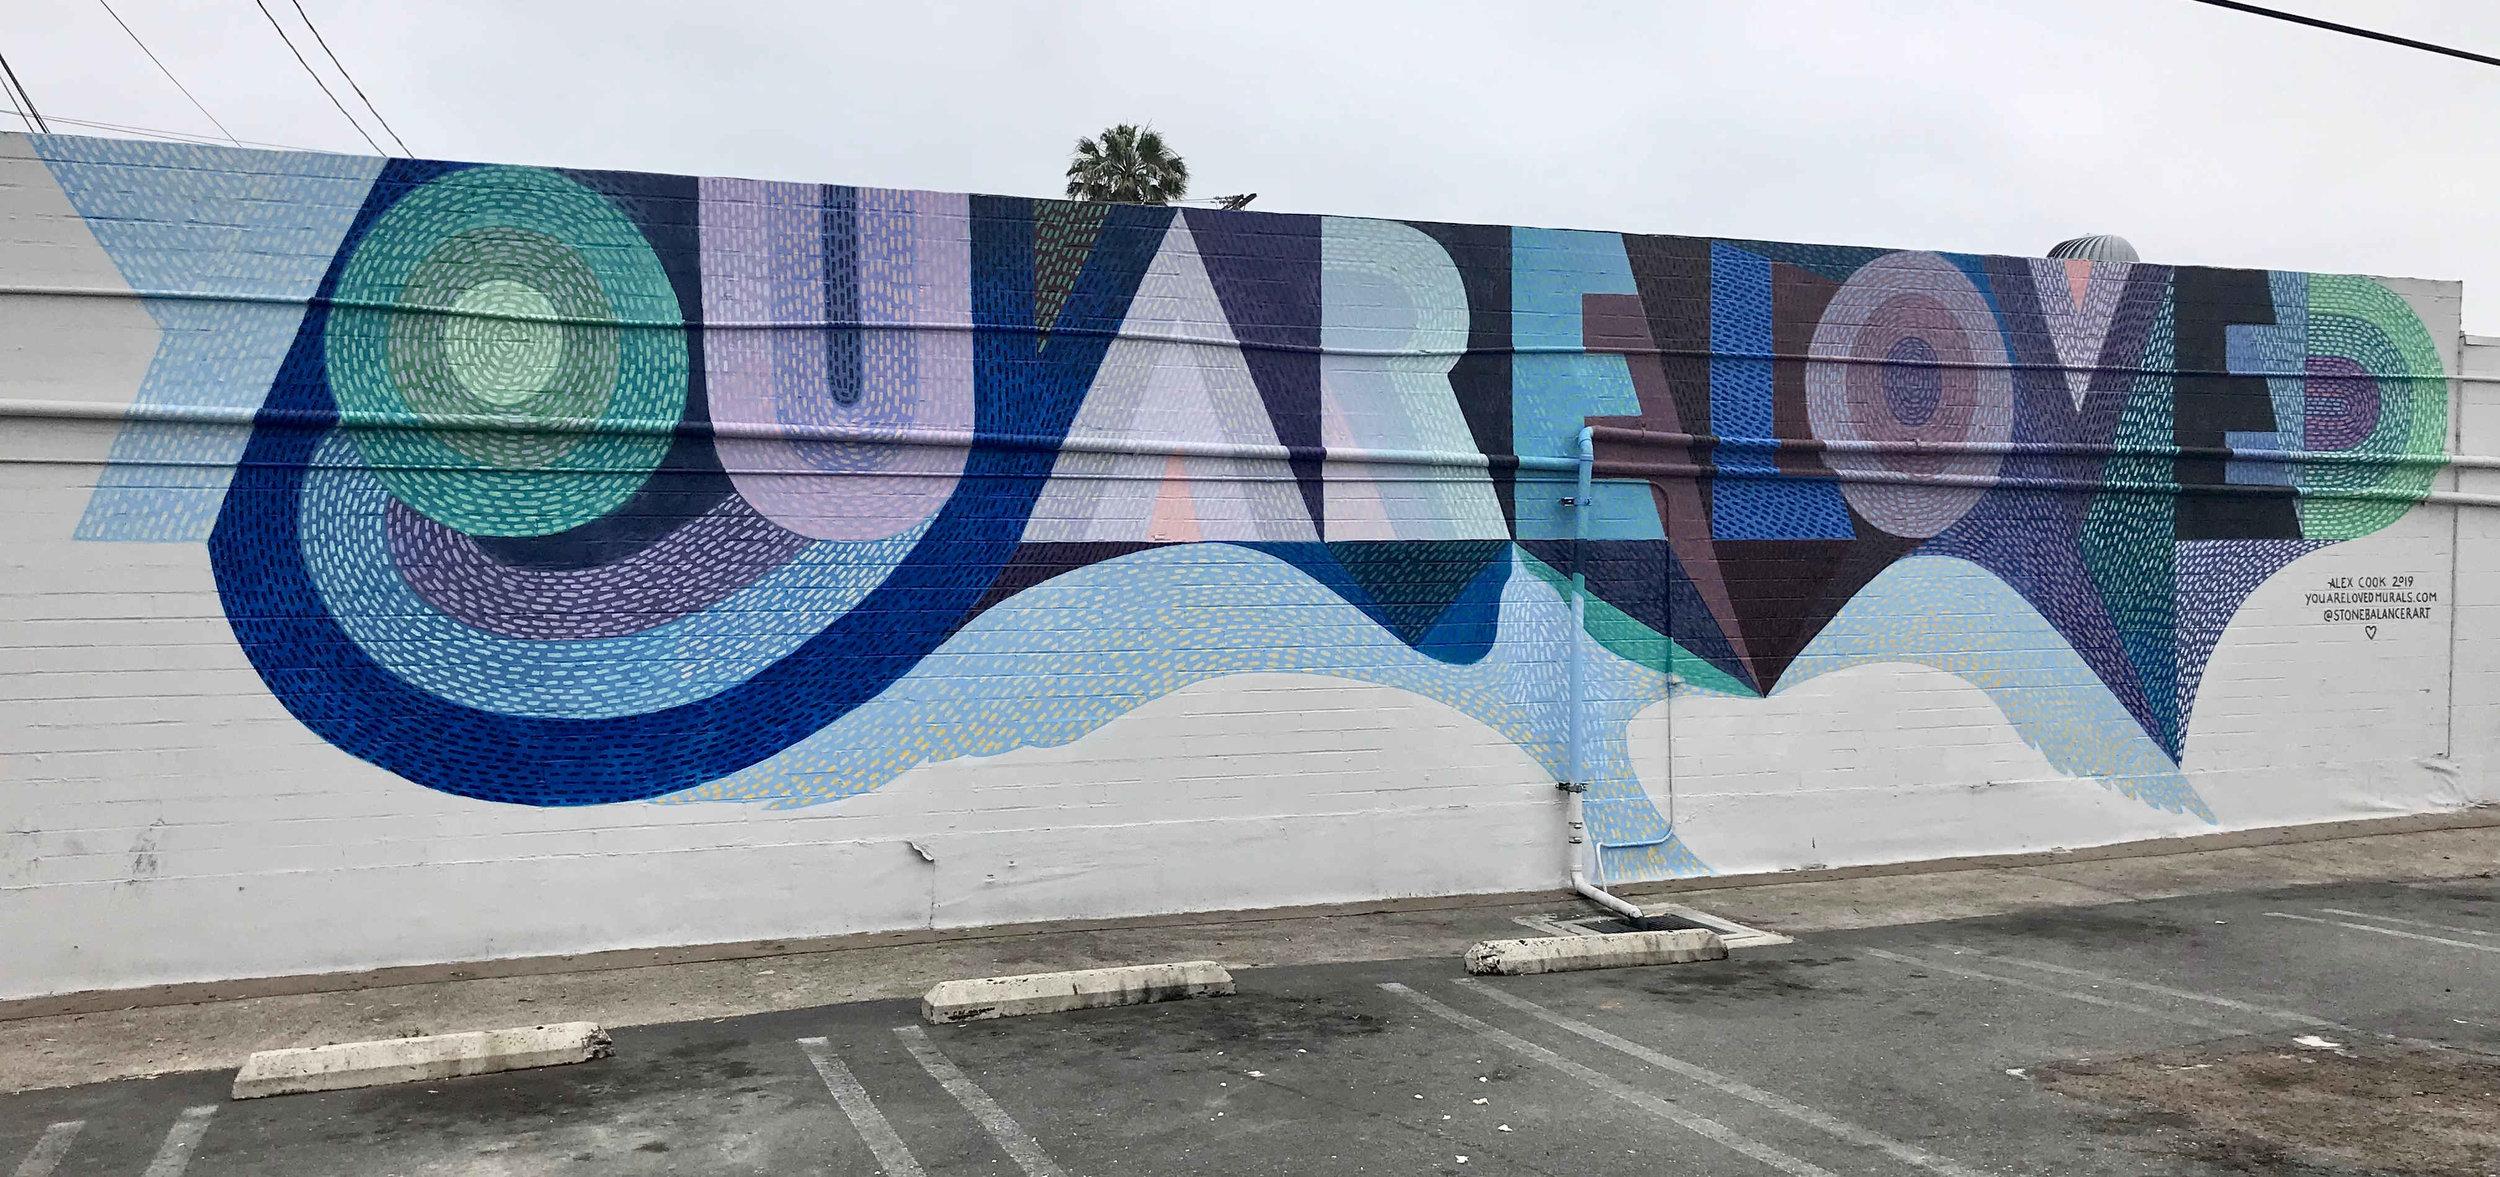 SOS Services, Costa Mesa, CA